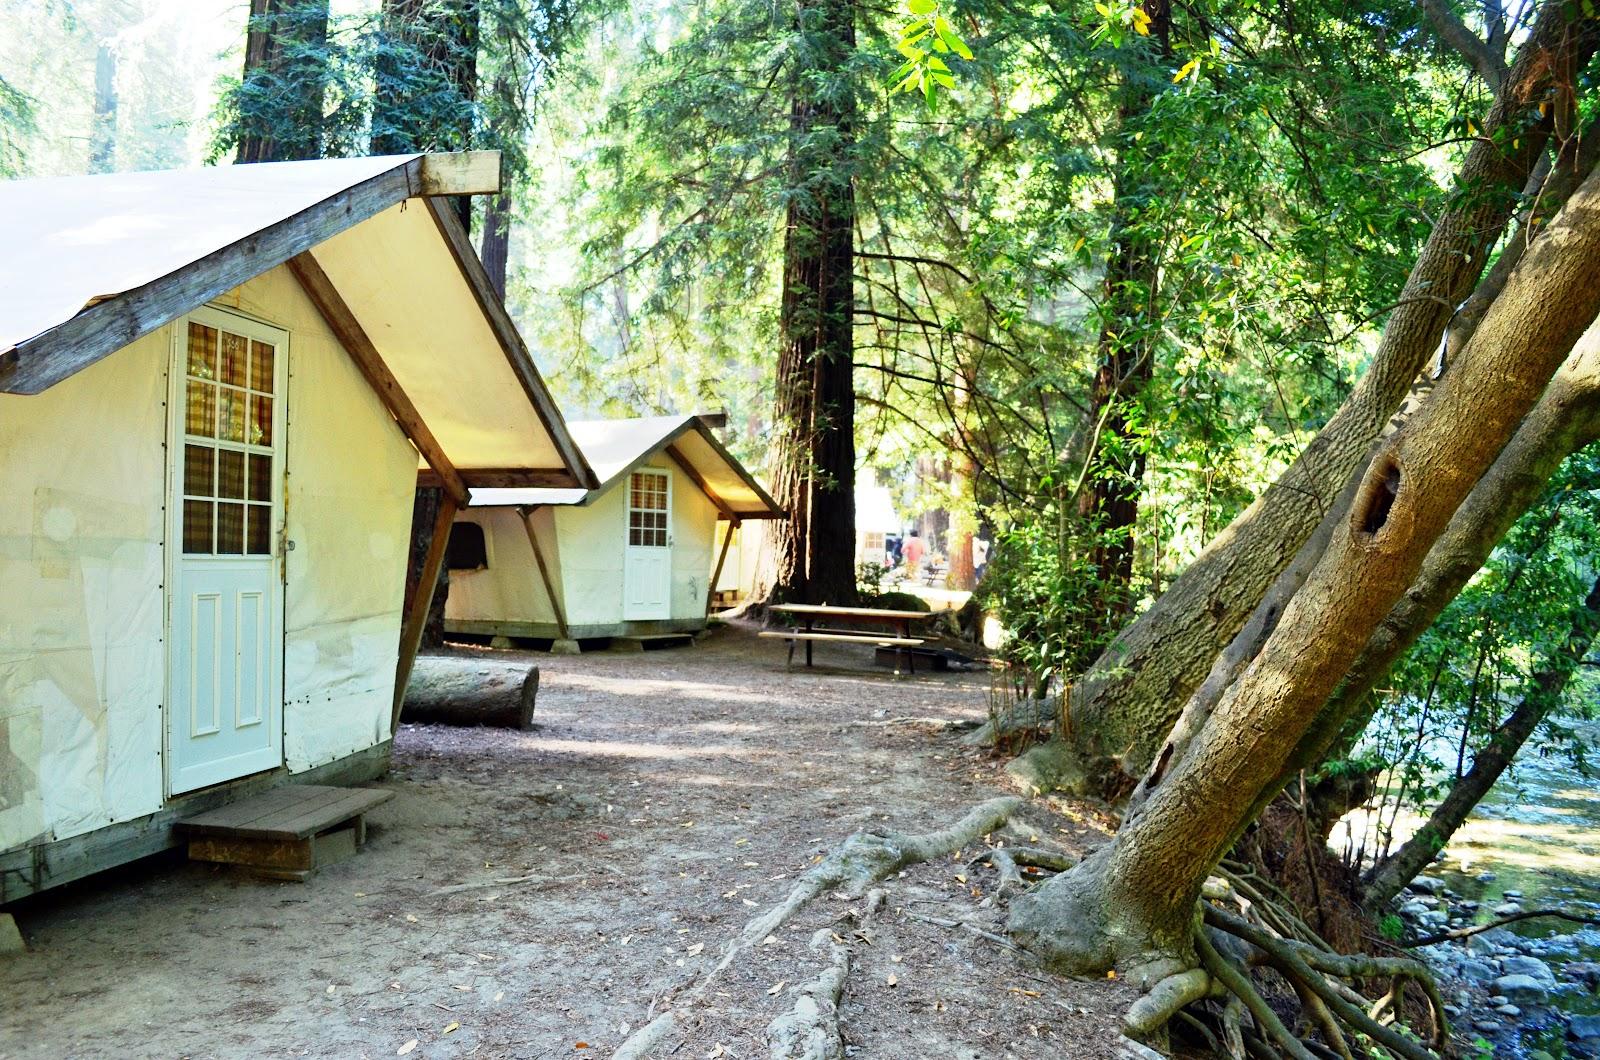 Tent cabins at Fernwood Resort right along the river. & El San Carleño: Big Sur